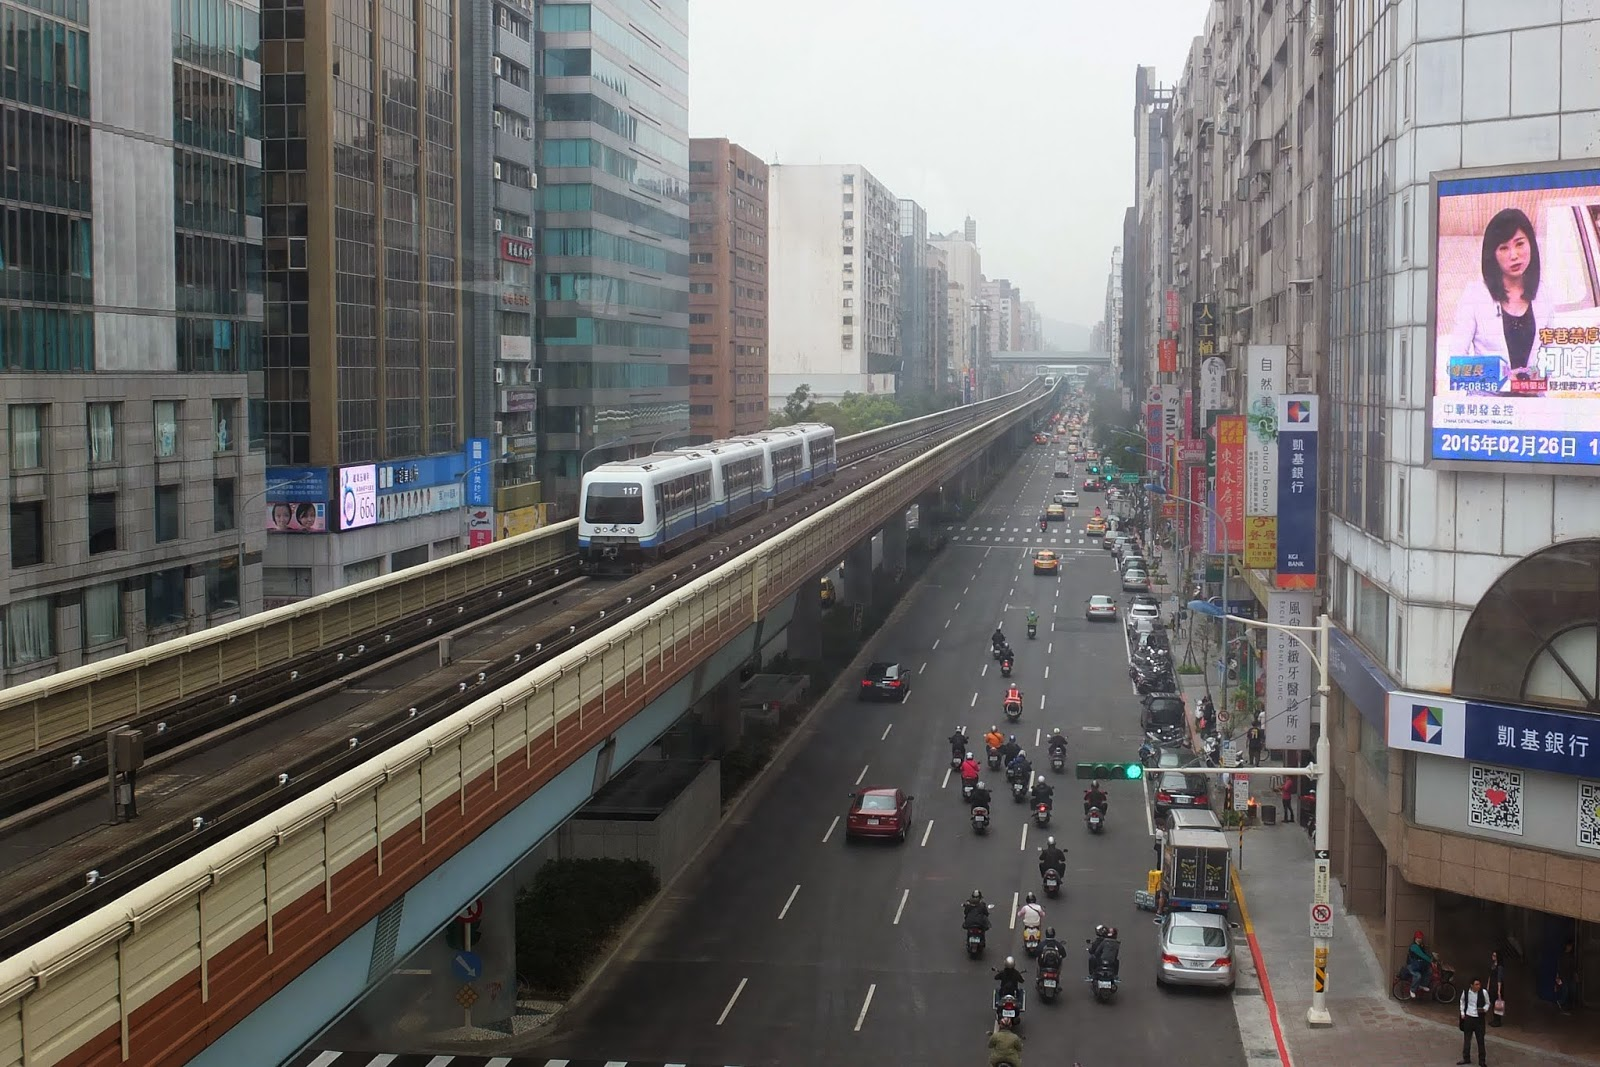 Taiwan-railway 台湾の高架鉄道